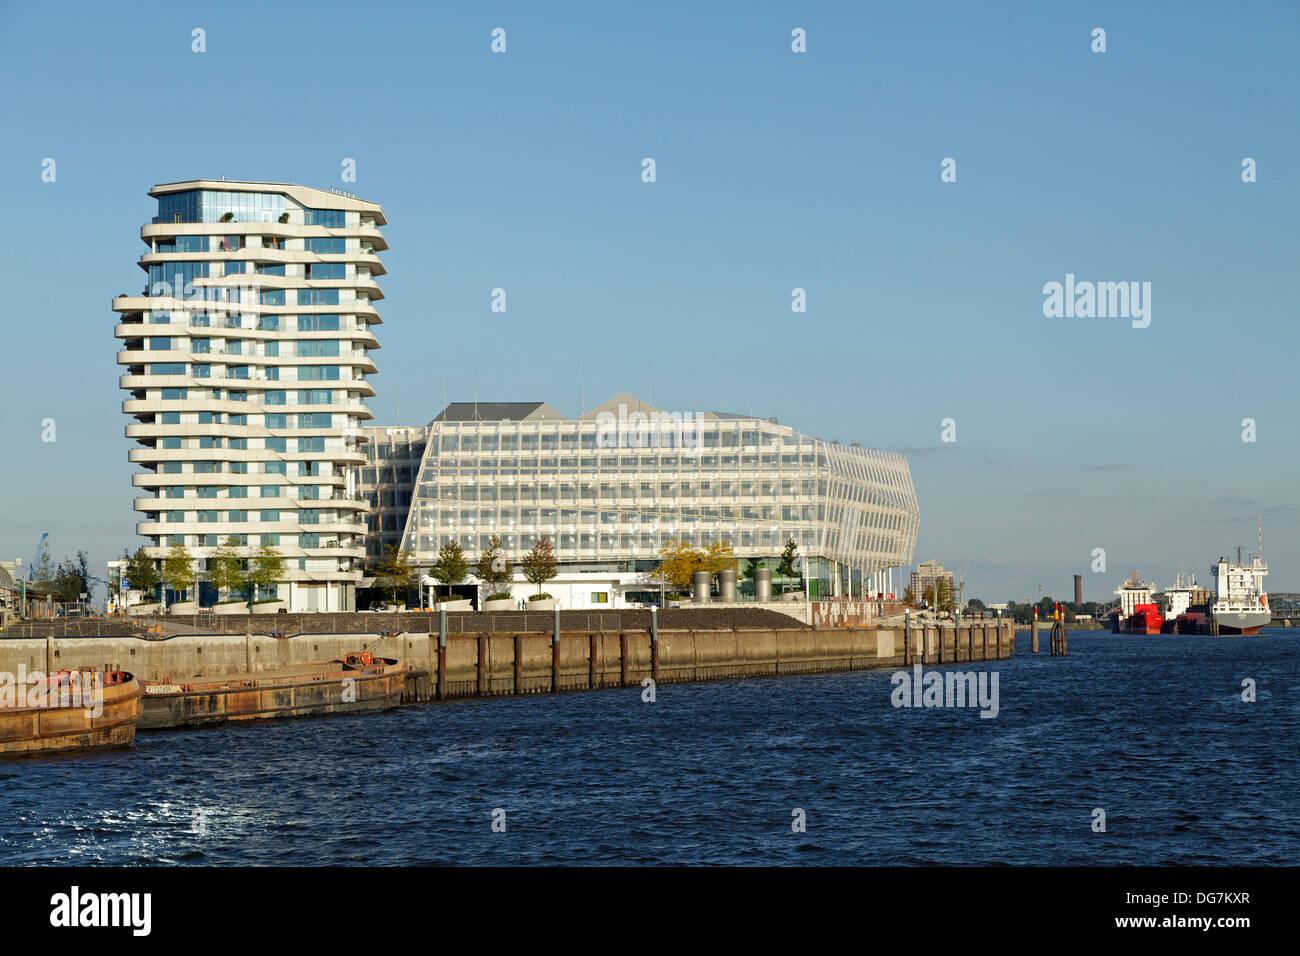 Marco-Polo-Tower and Unilever House, Harbor City Hamburg, Germany Stock Photo